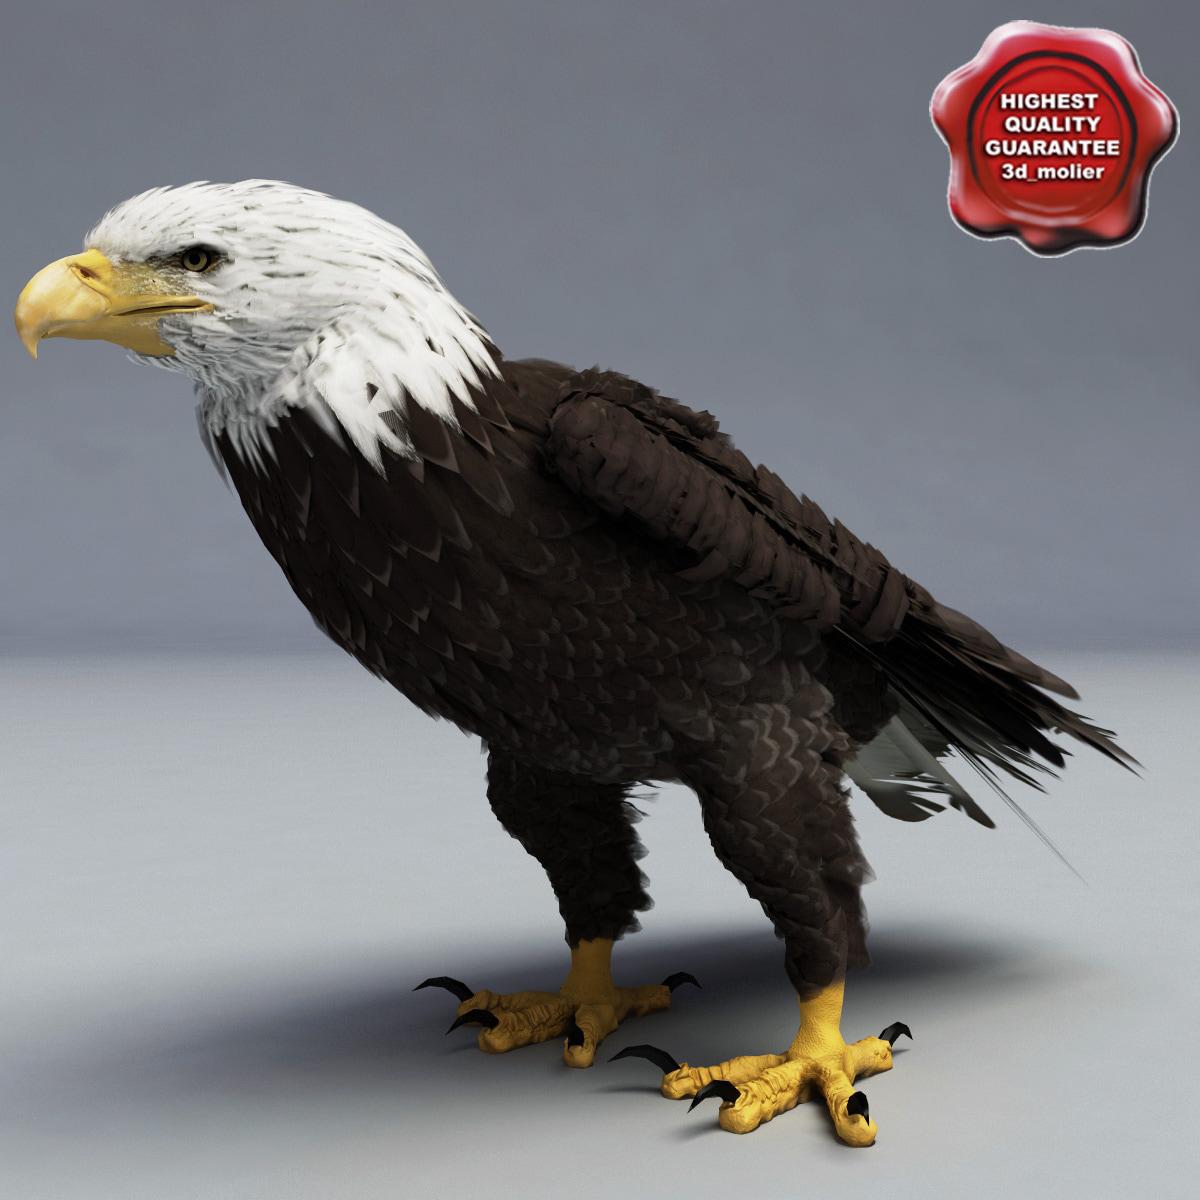 Bald_Eagle_Pose6_00.jpg